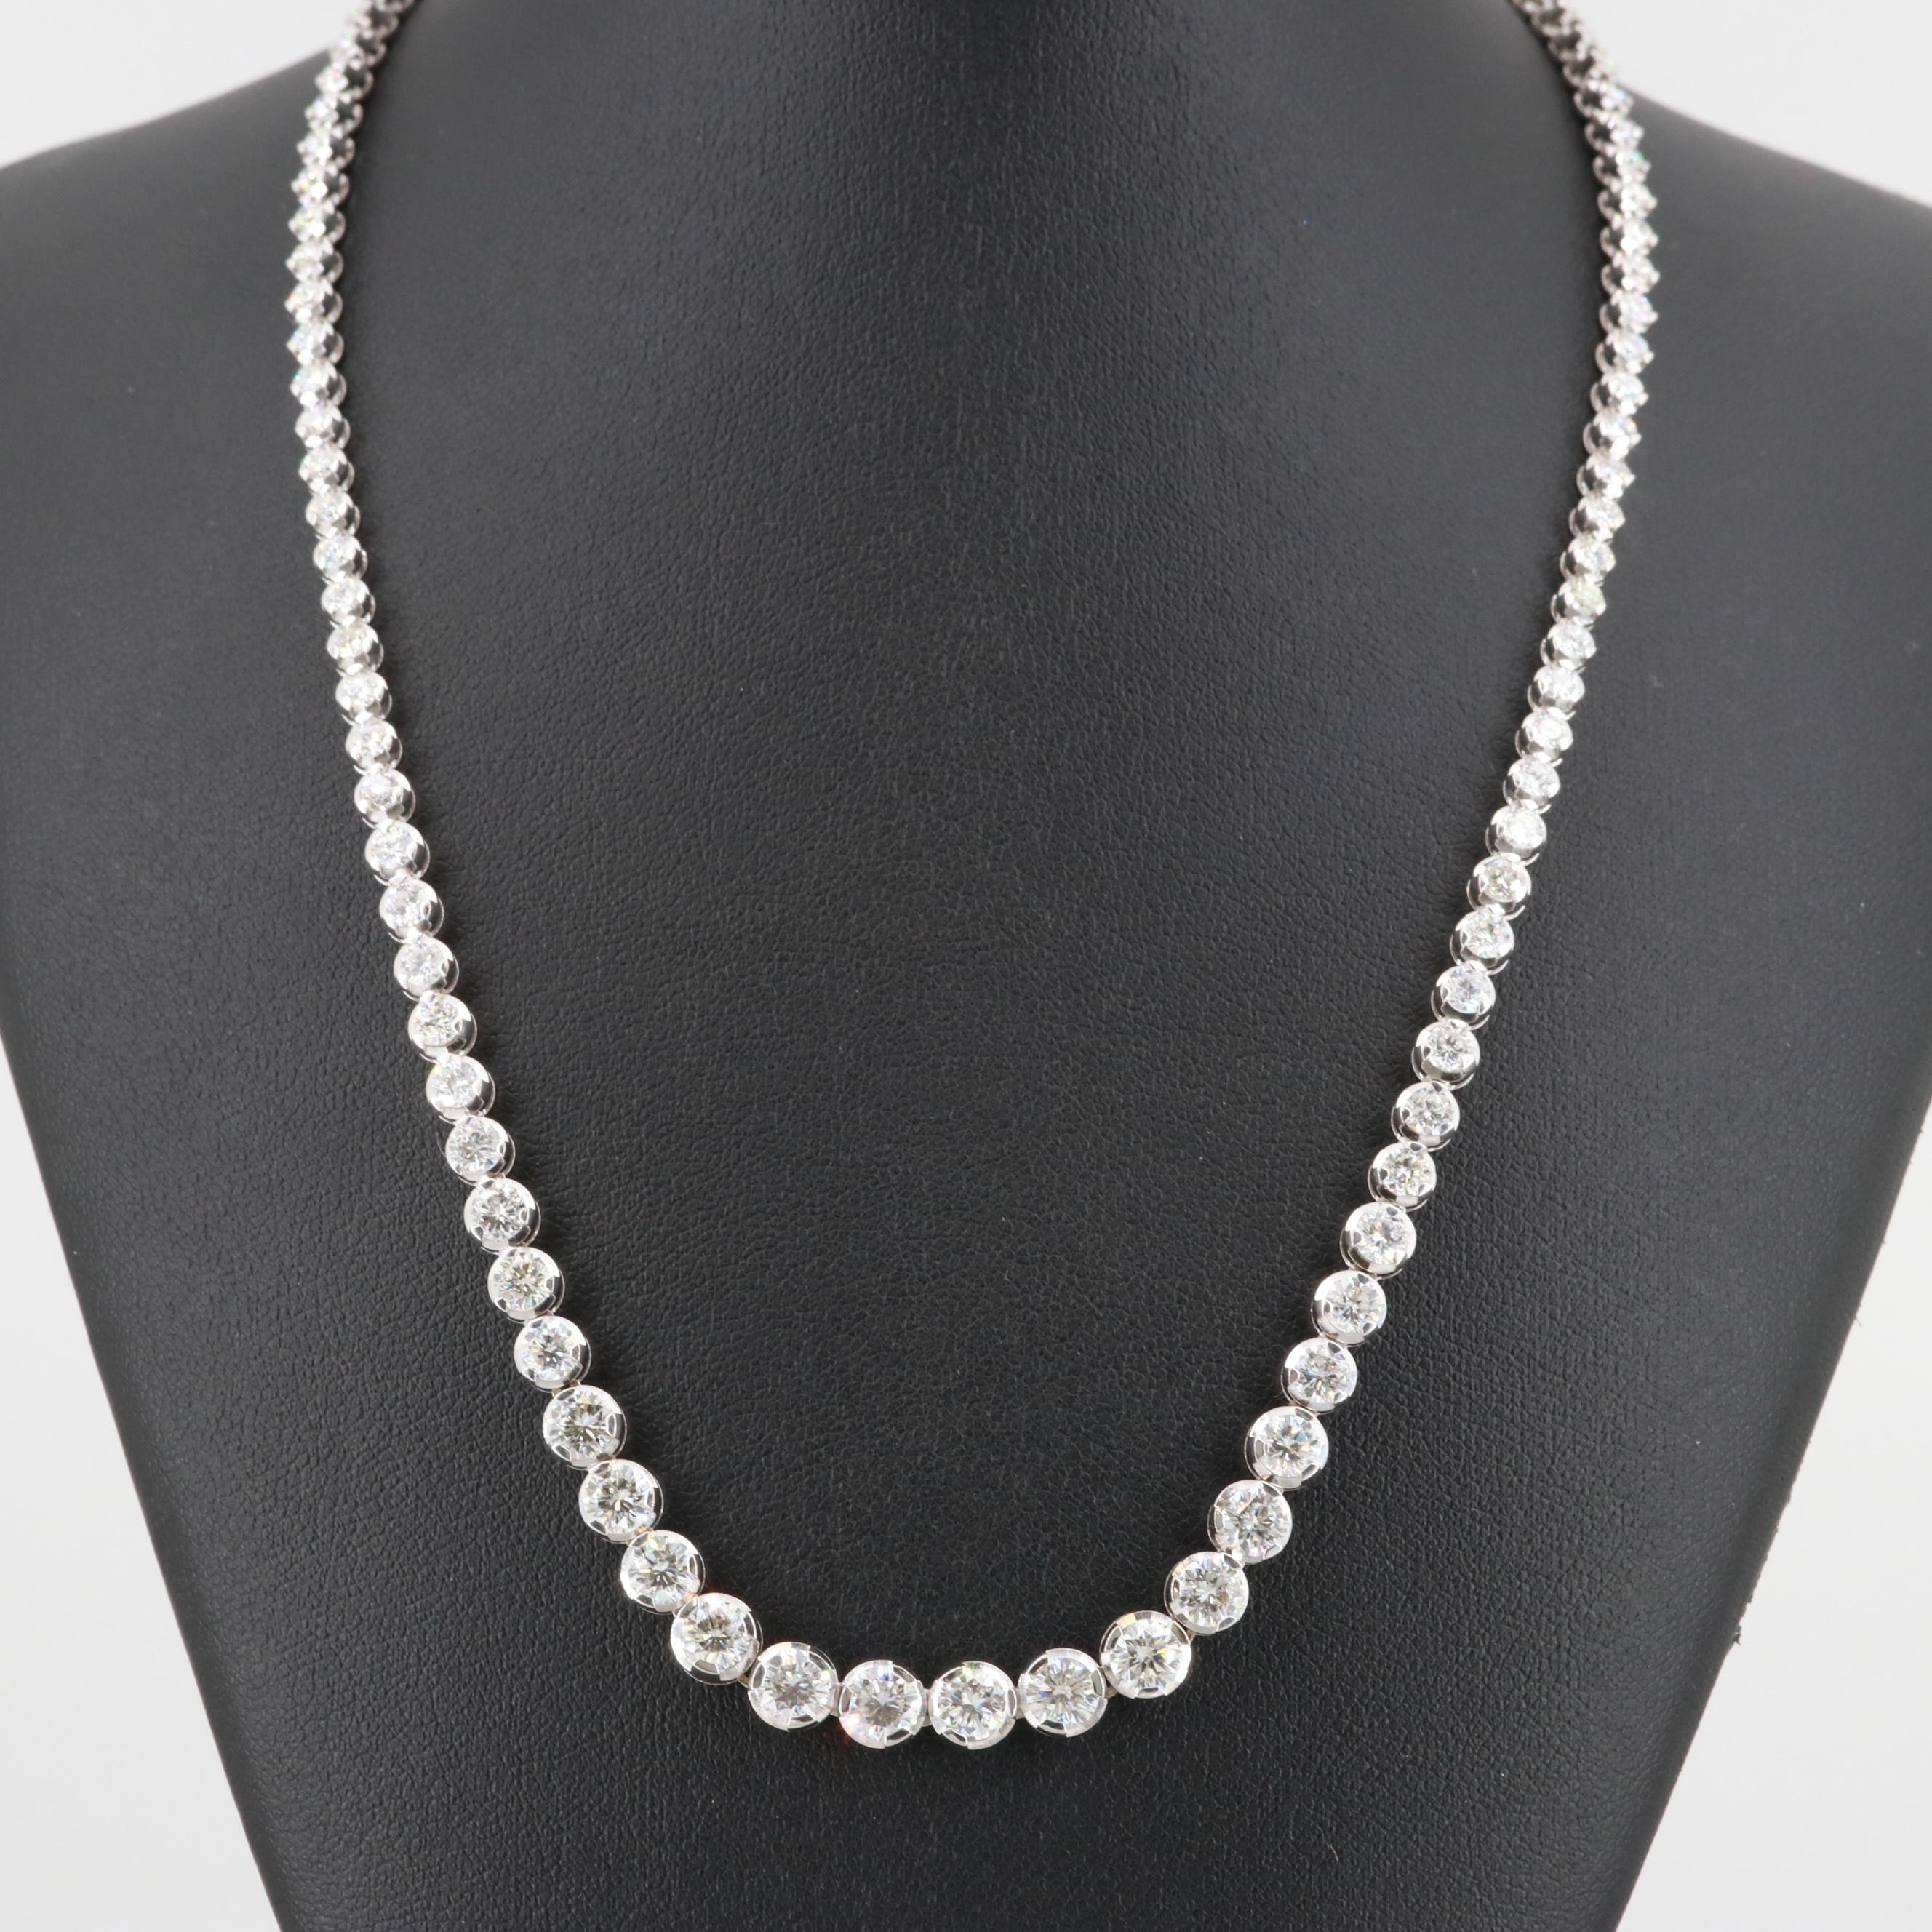 Italian 18K White Gold 11.25 CTW Diamond Graduated Rivière Necklace